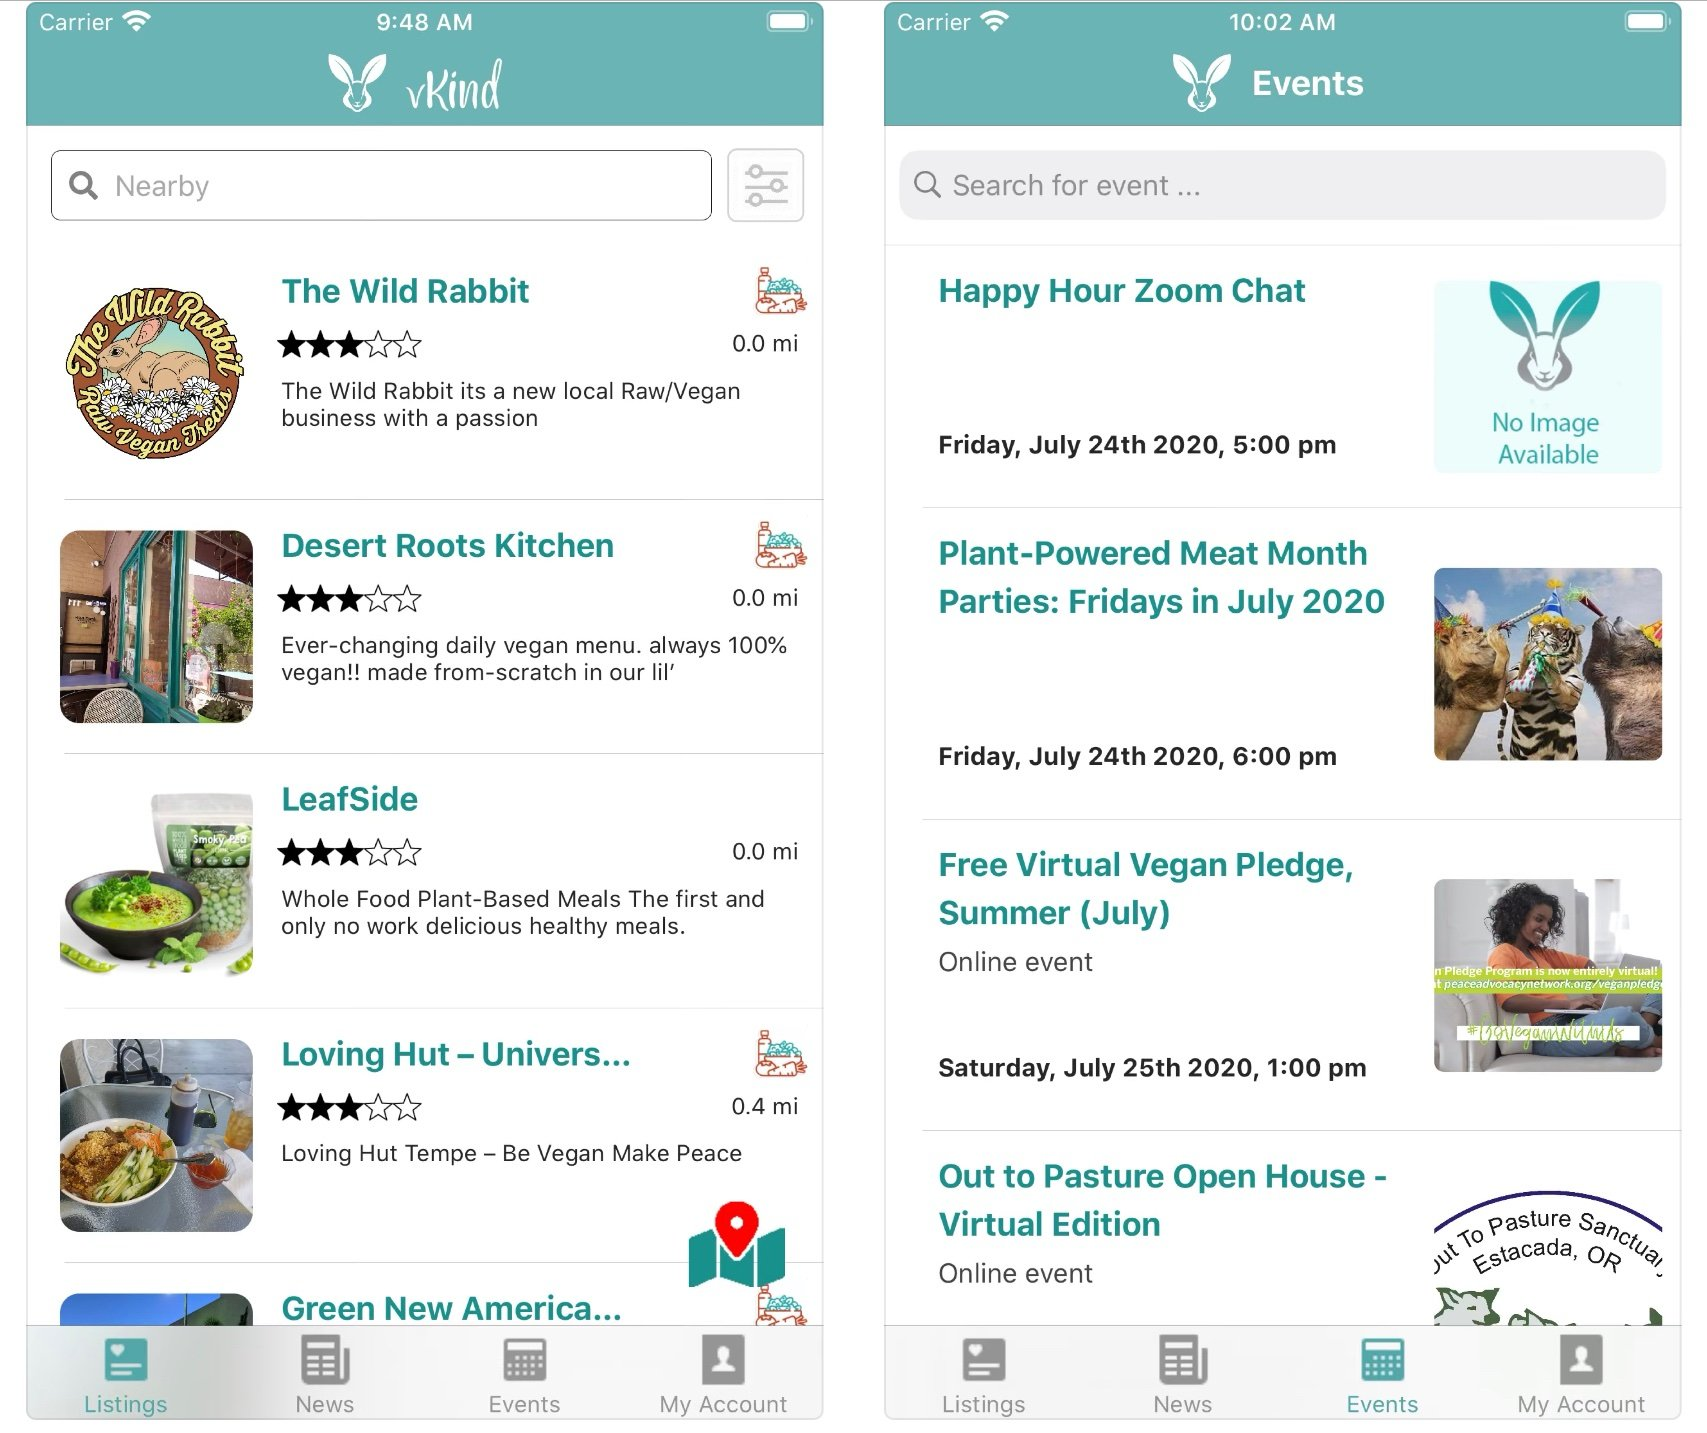 vKind app